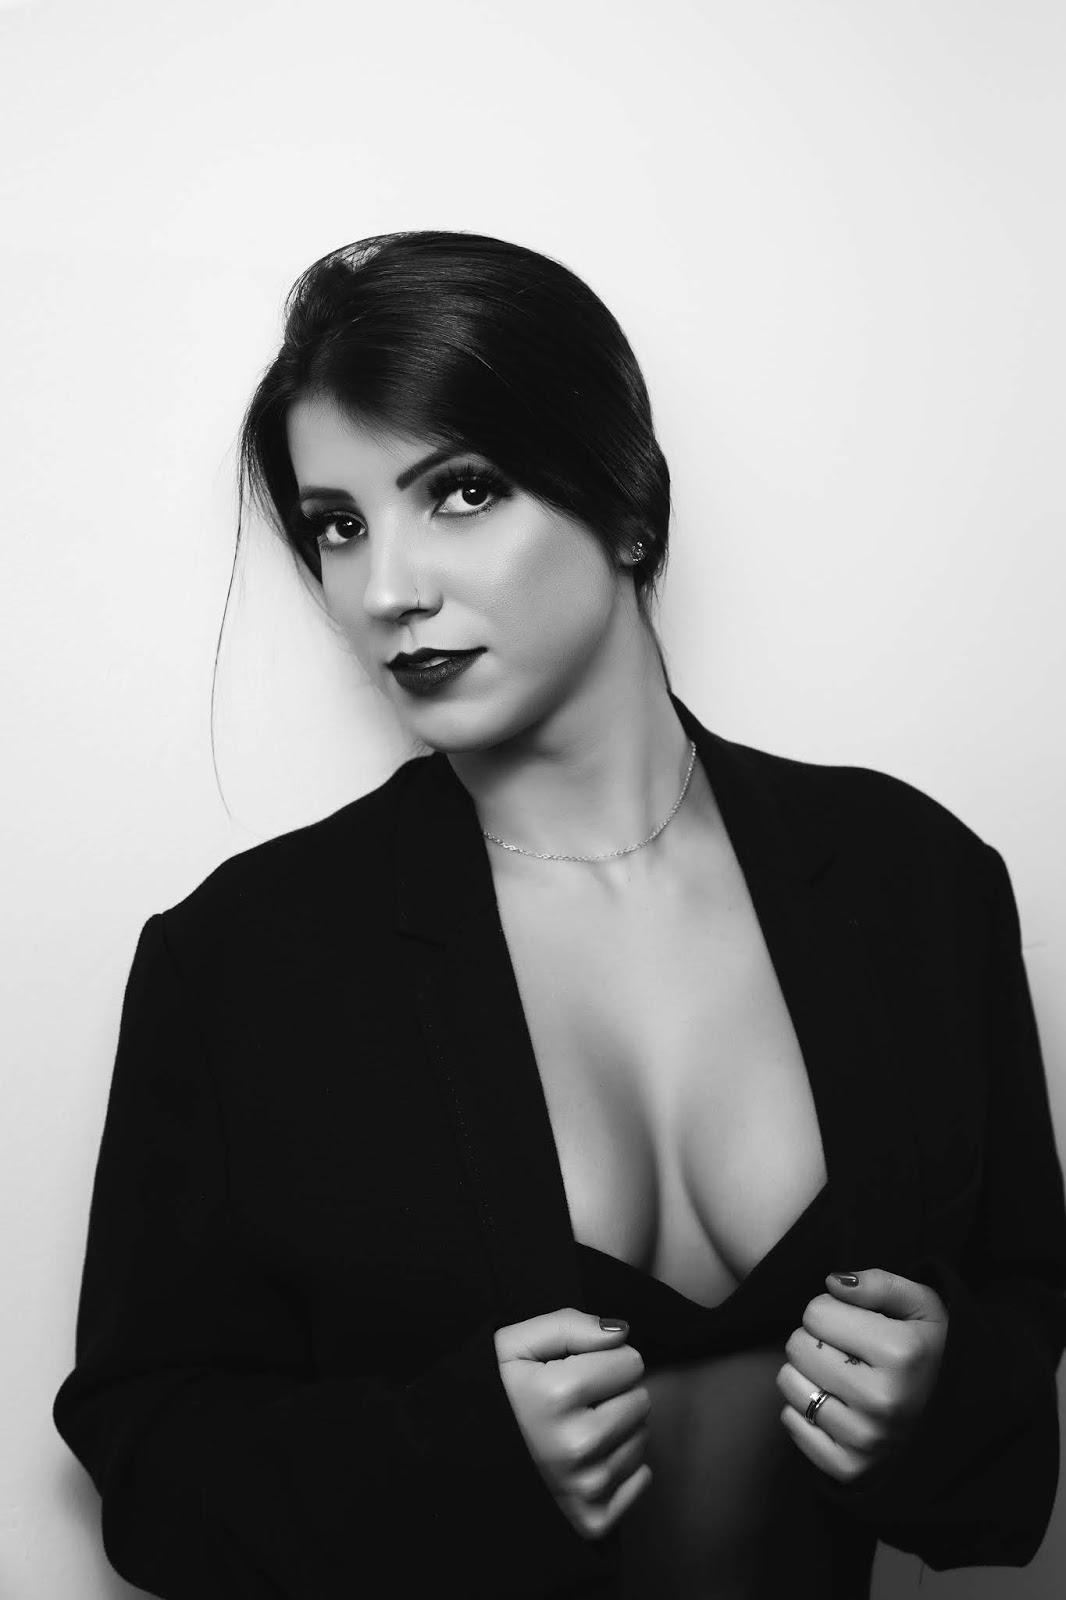 Michelle Slonkowskyj p&b